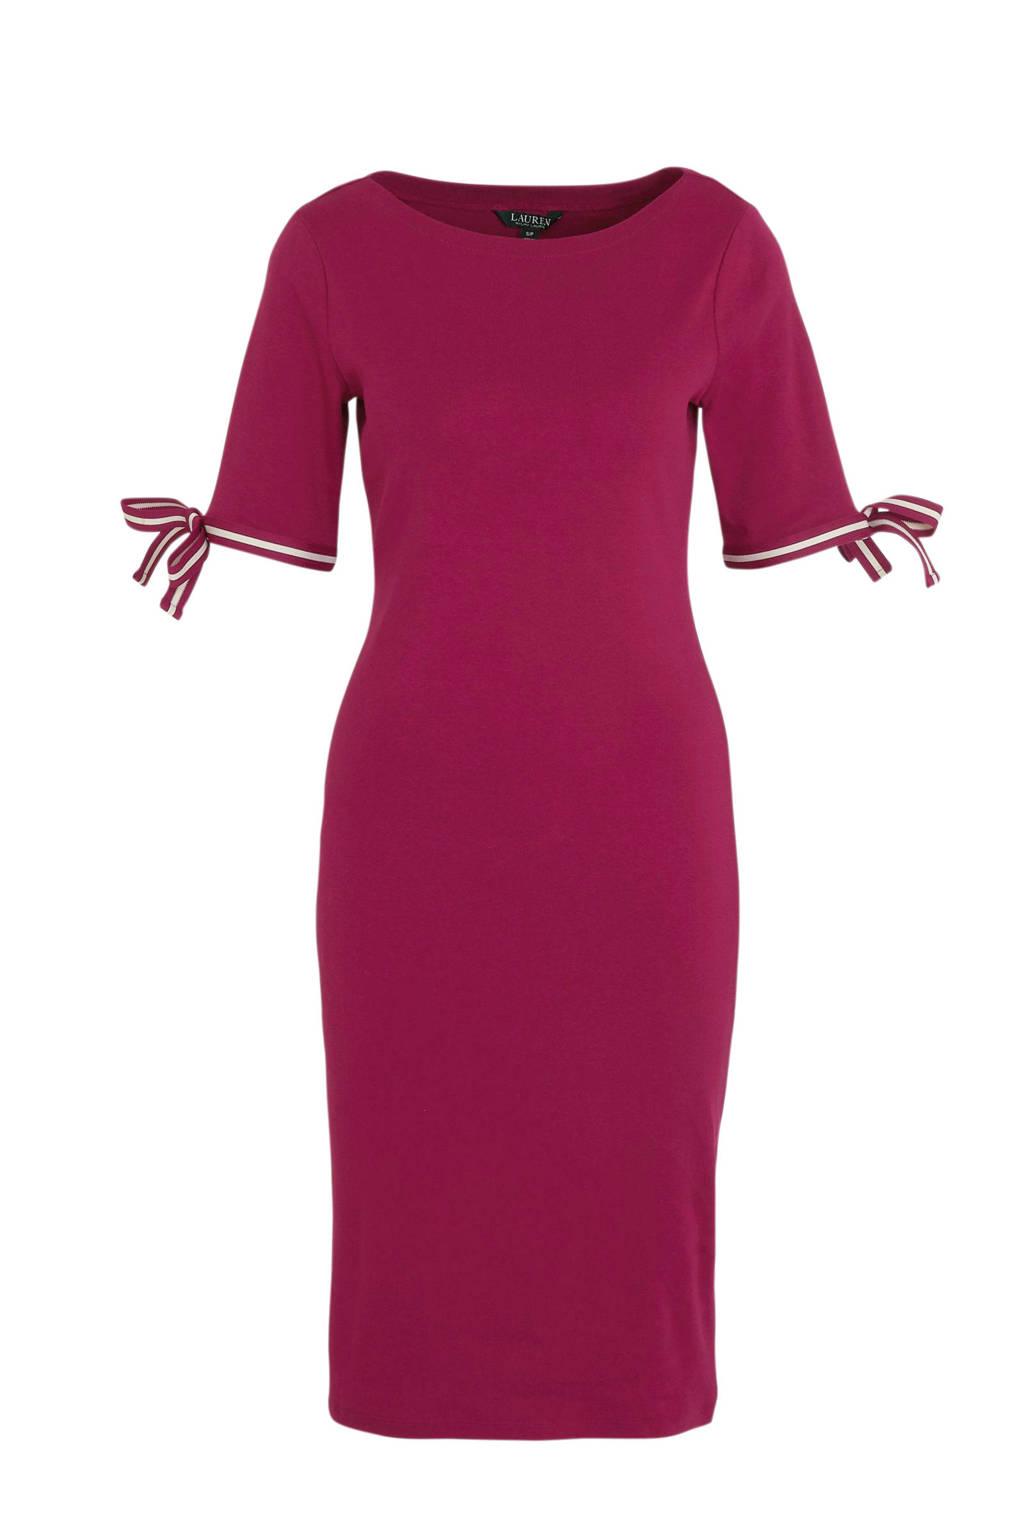 Lauren Ralph Lauren jersey jurk Brandeis fuchsia, Fuchsia